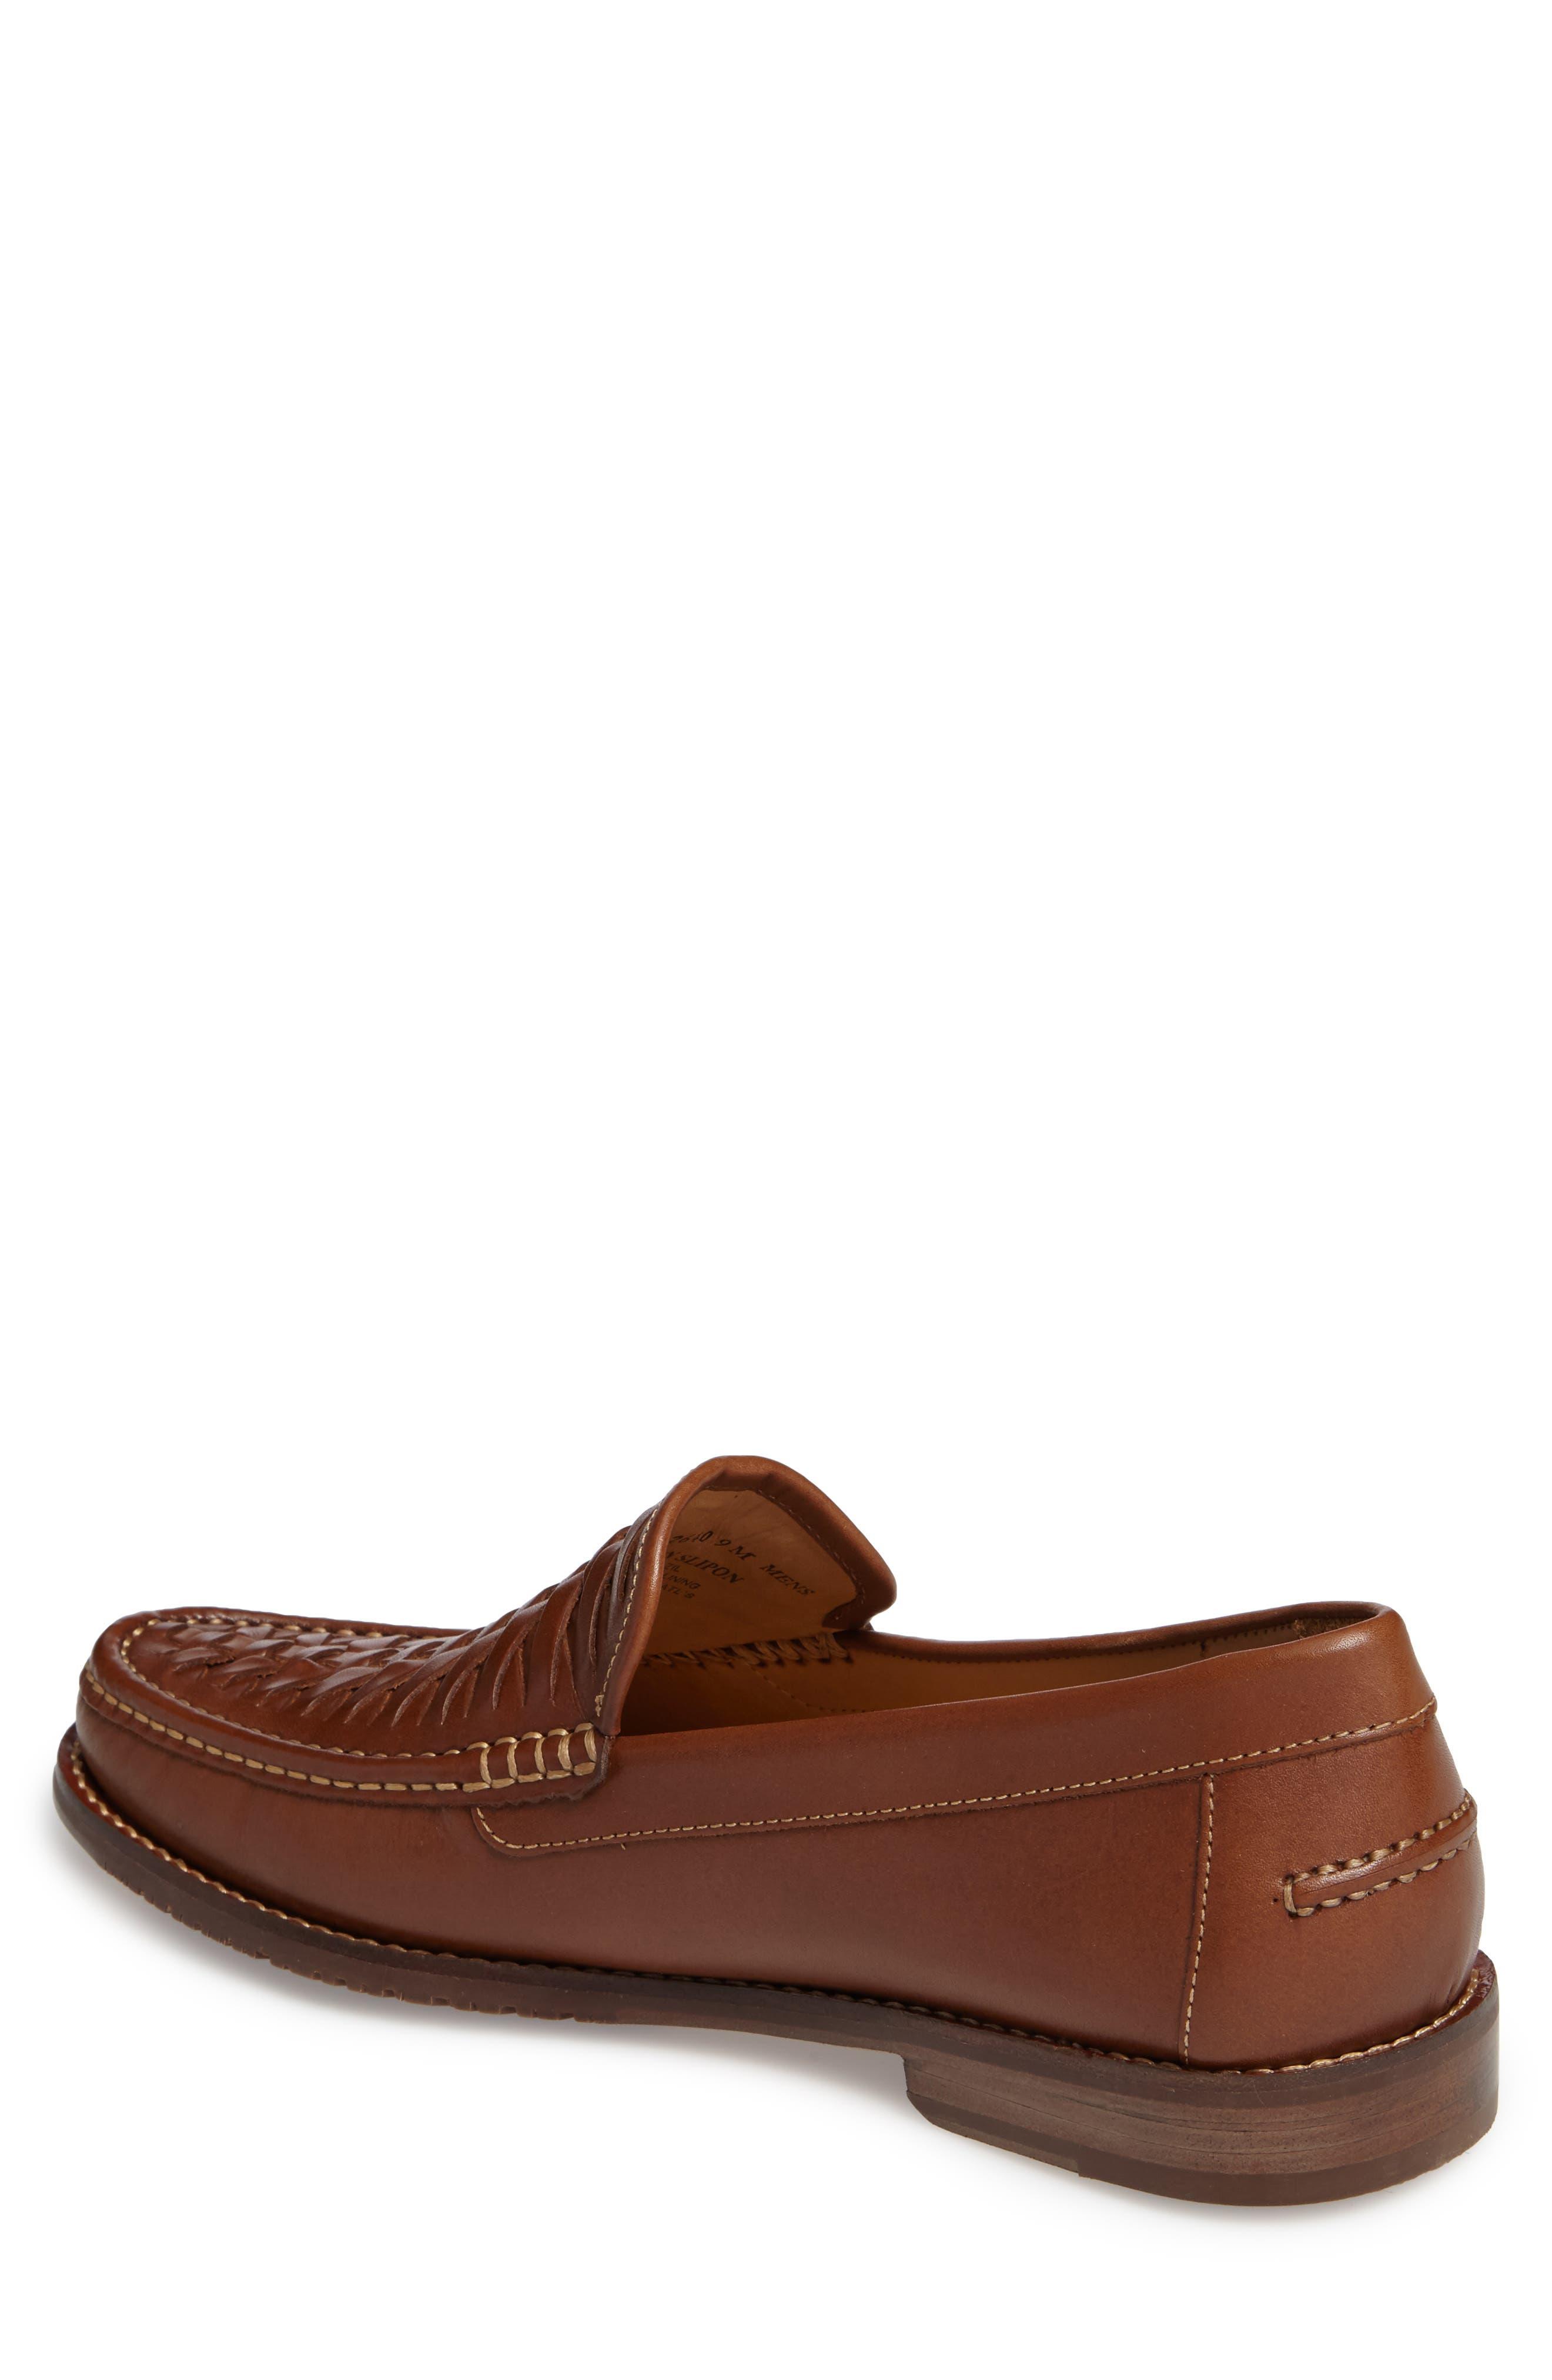 Fynn Loafer,                             Alternate thumbnail 2, color,                             Saddle Brown Leather